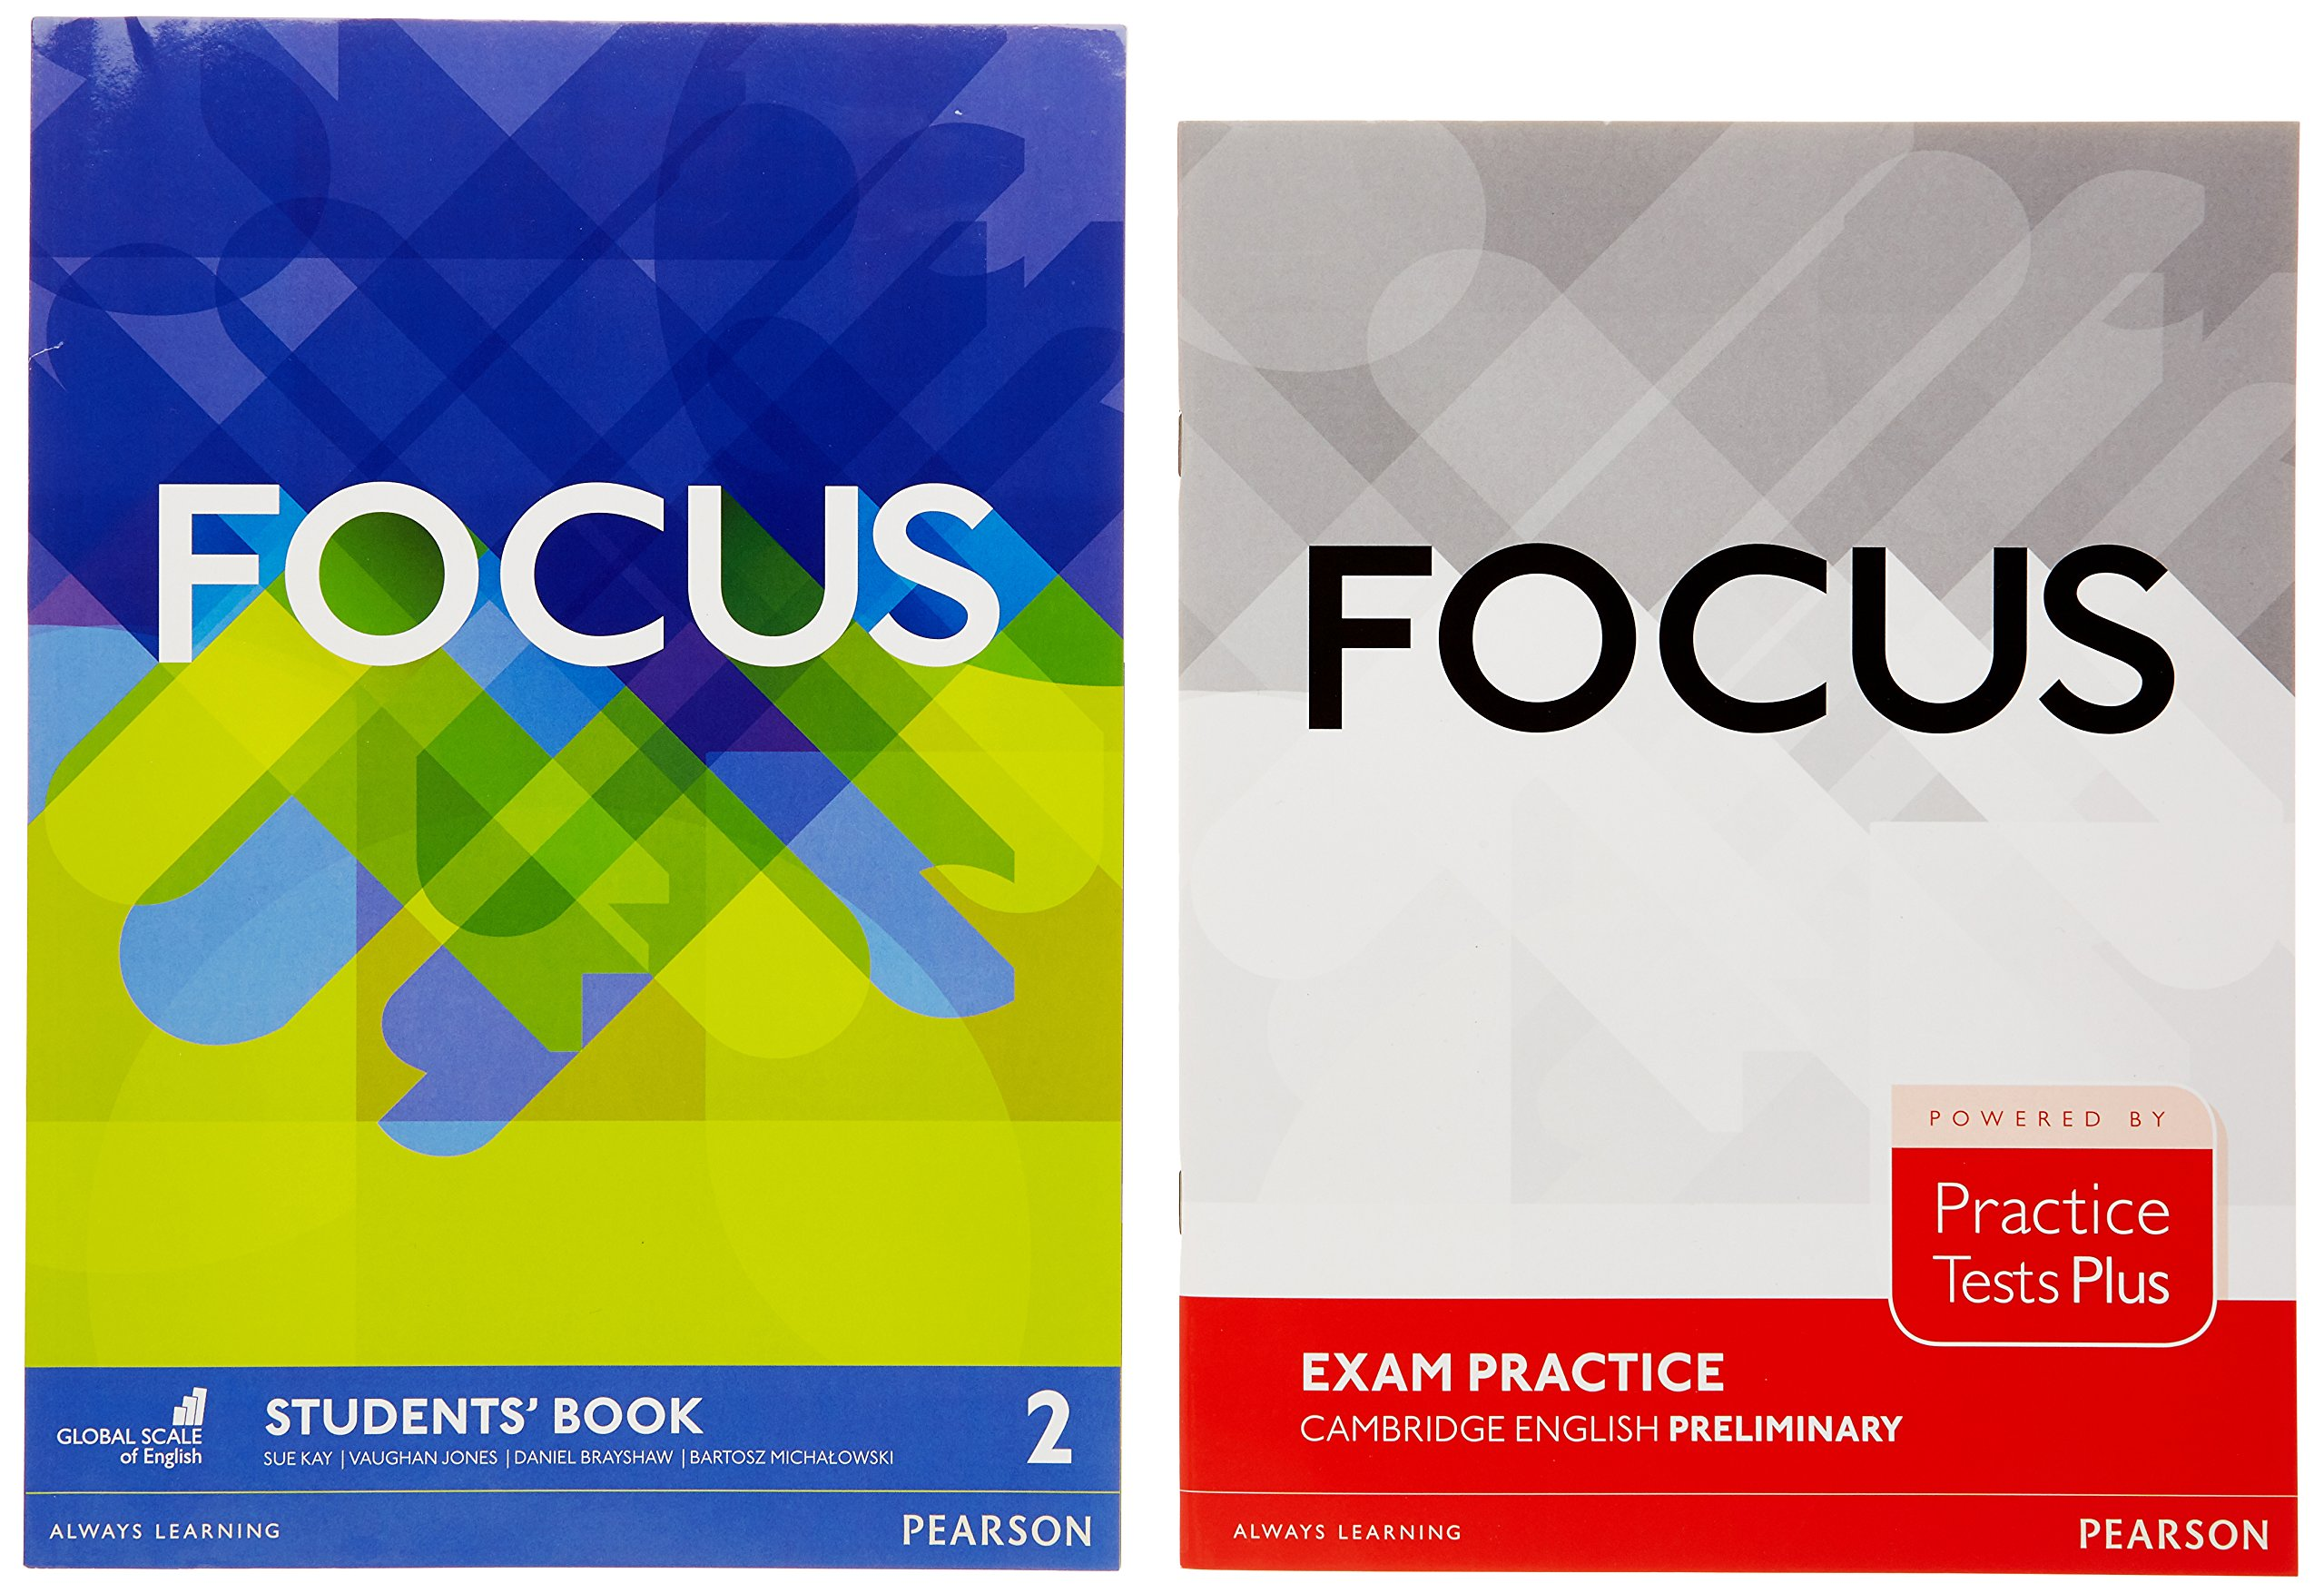 Focus BrE 2 Students Book & Practice Tests Plus Preliminary Booklet Pack: Amazon.es: Jones, Vaughan, Kay, Sue, Brayshaw, Daniel, Whitehead, Russell: Libros en idiomas extranjeros